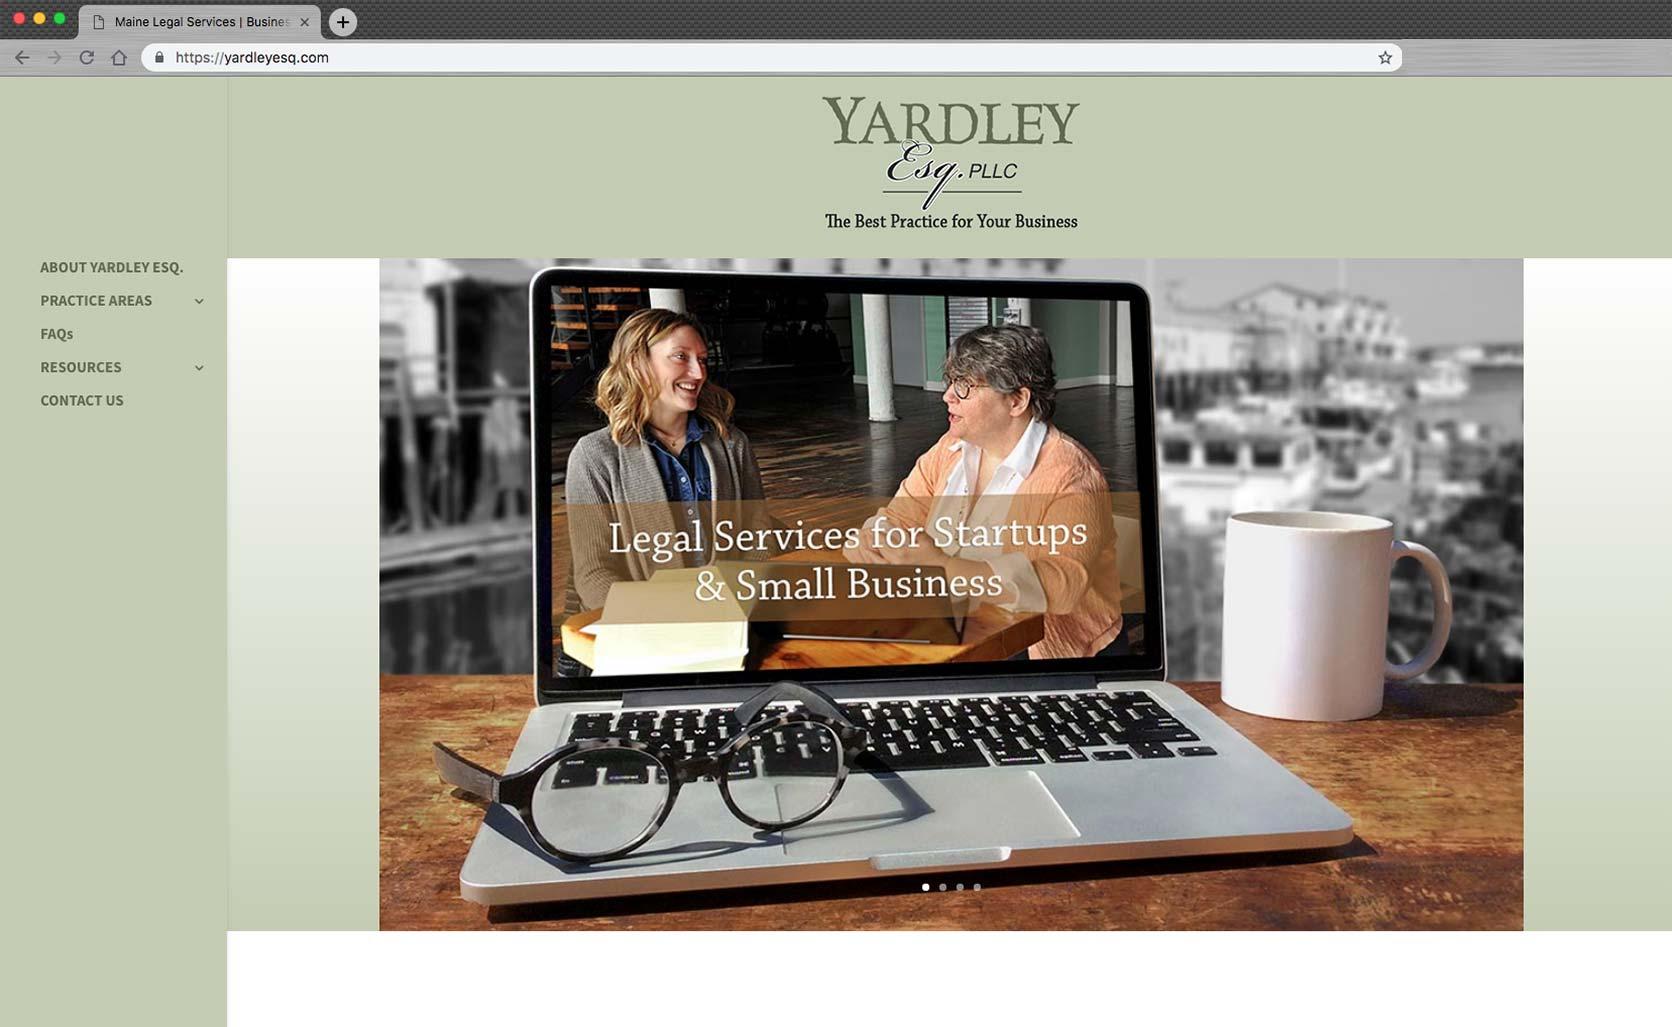 Yardleyesq.com